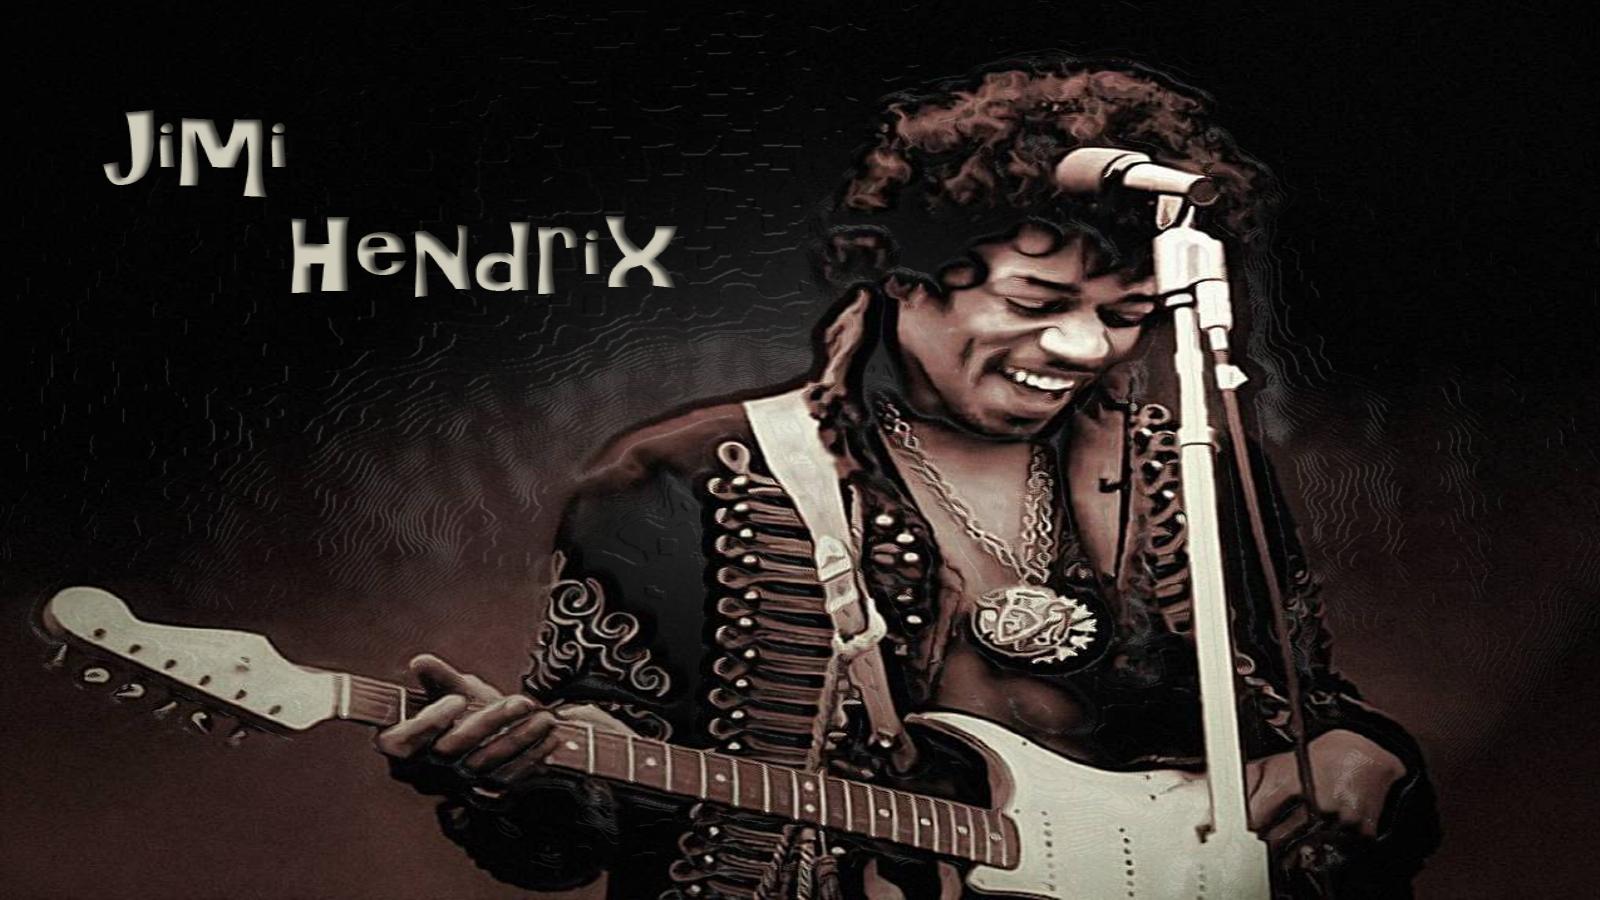 Jimi hendrix wallpapers wallpapersafari - Jimi hendrix wallpaper psychedelic ...